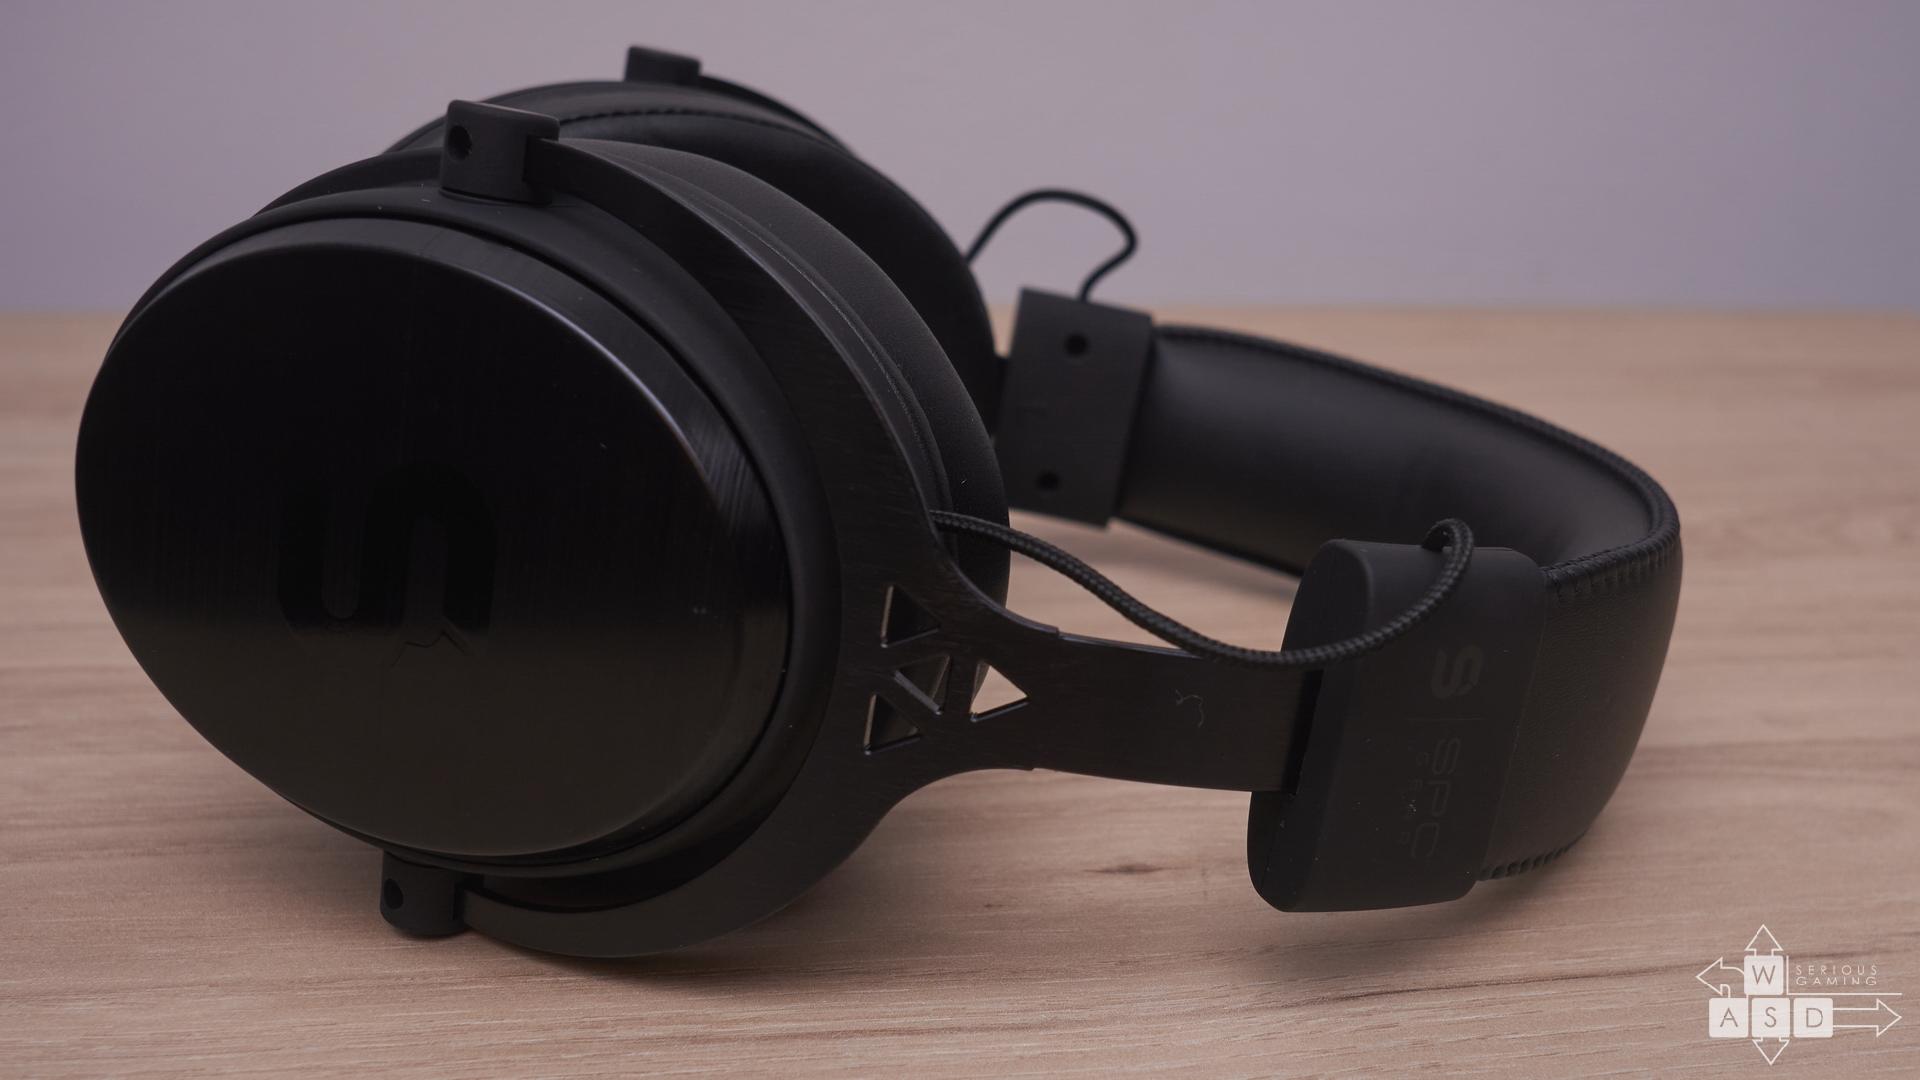 SPC Gear Viro Plus USB review | WASD.ro